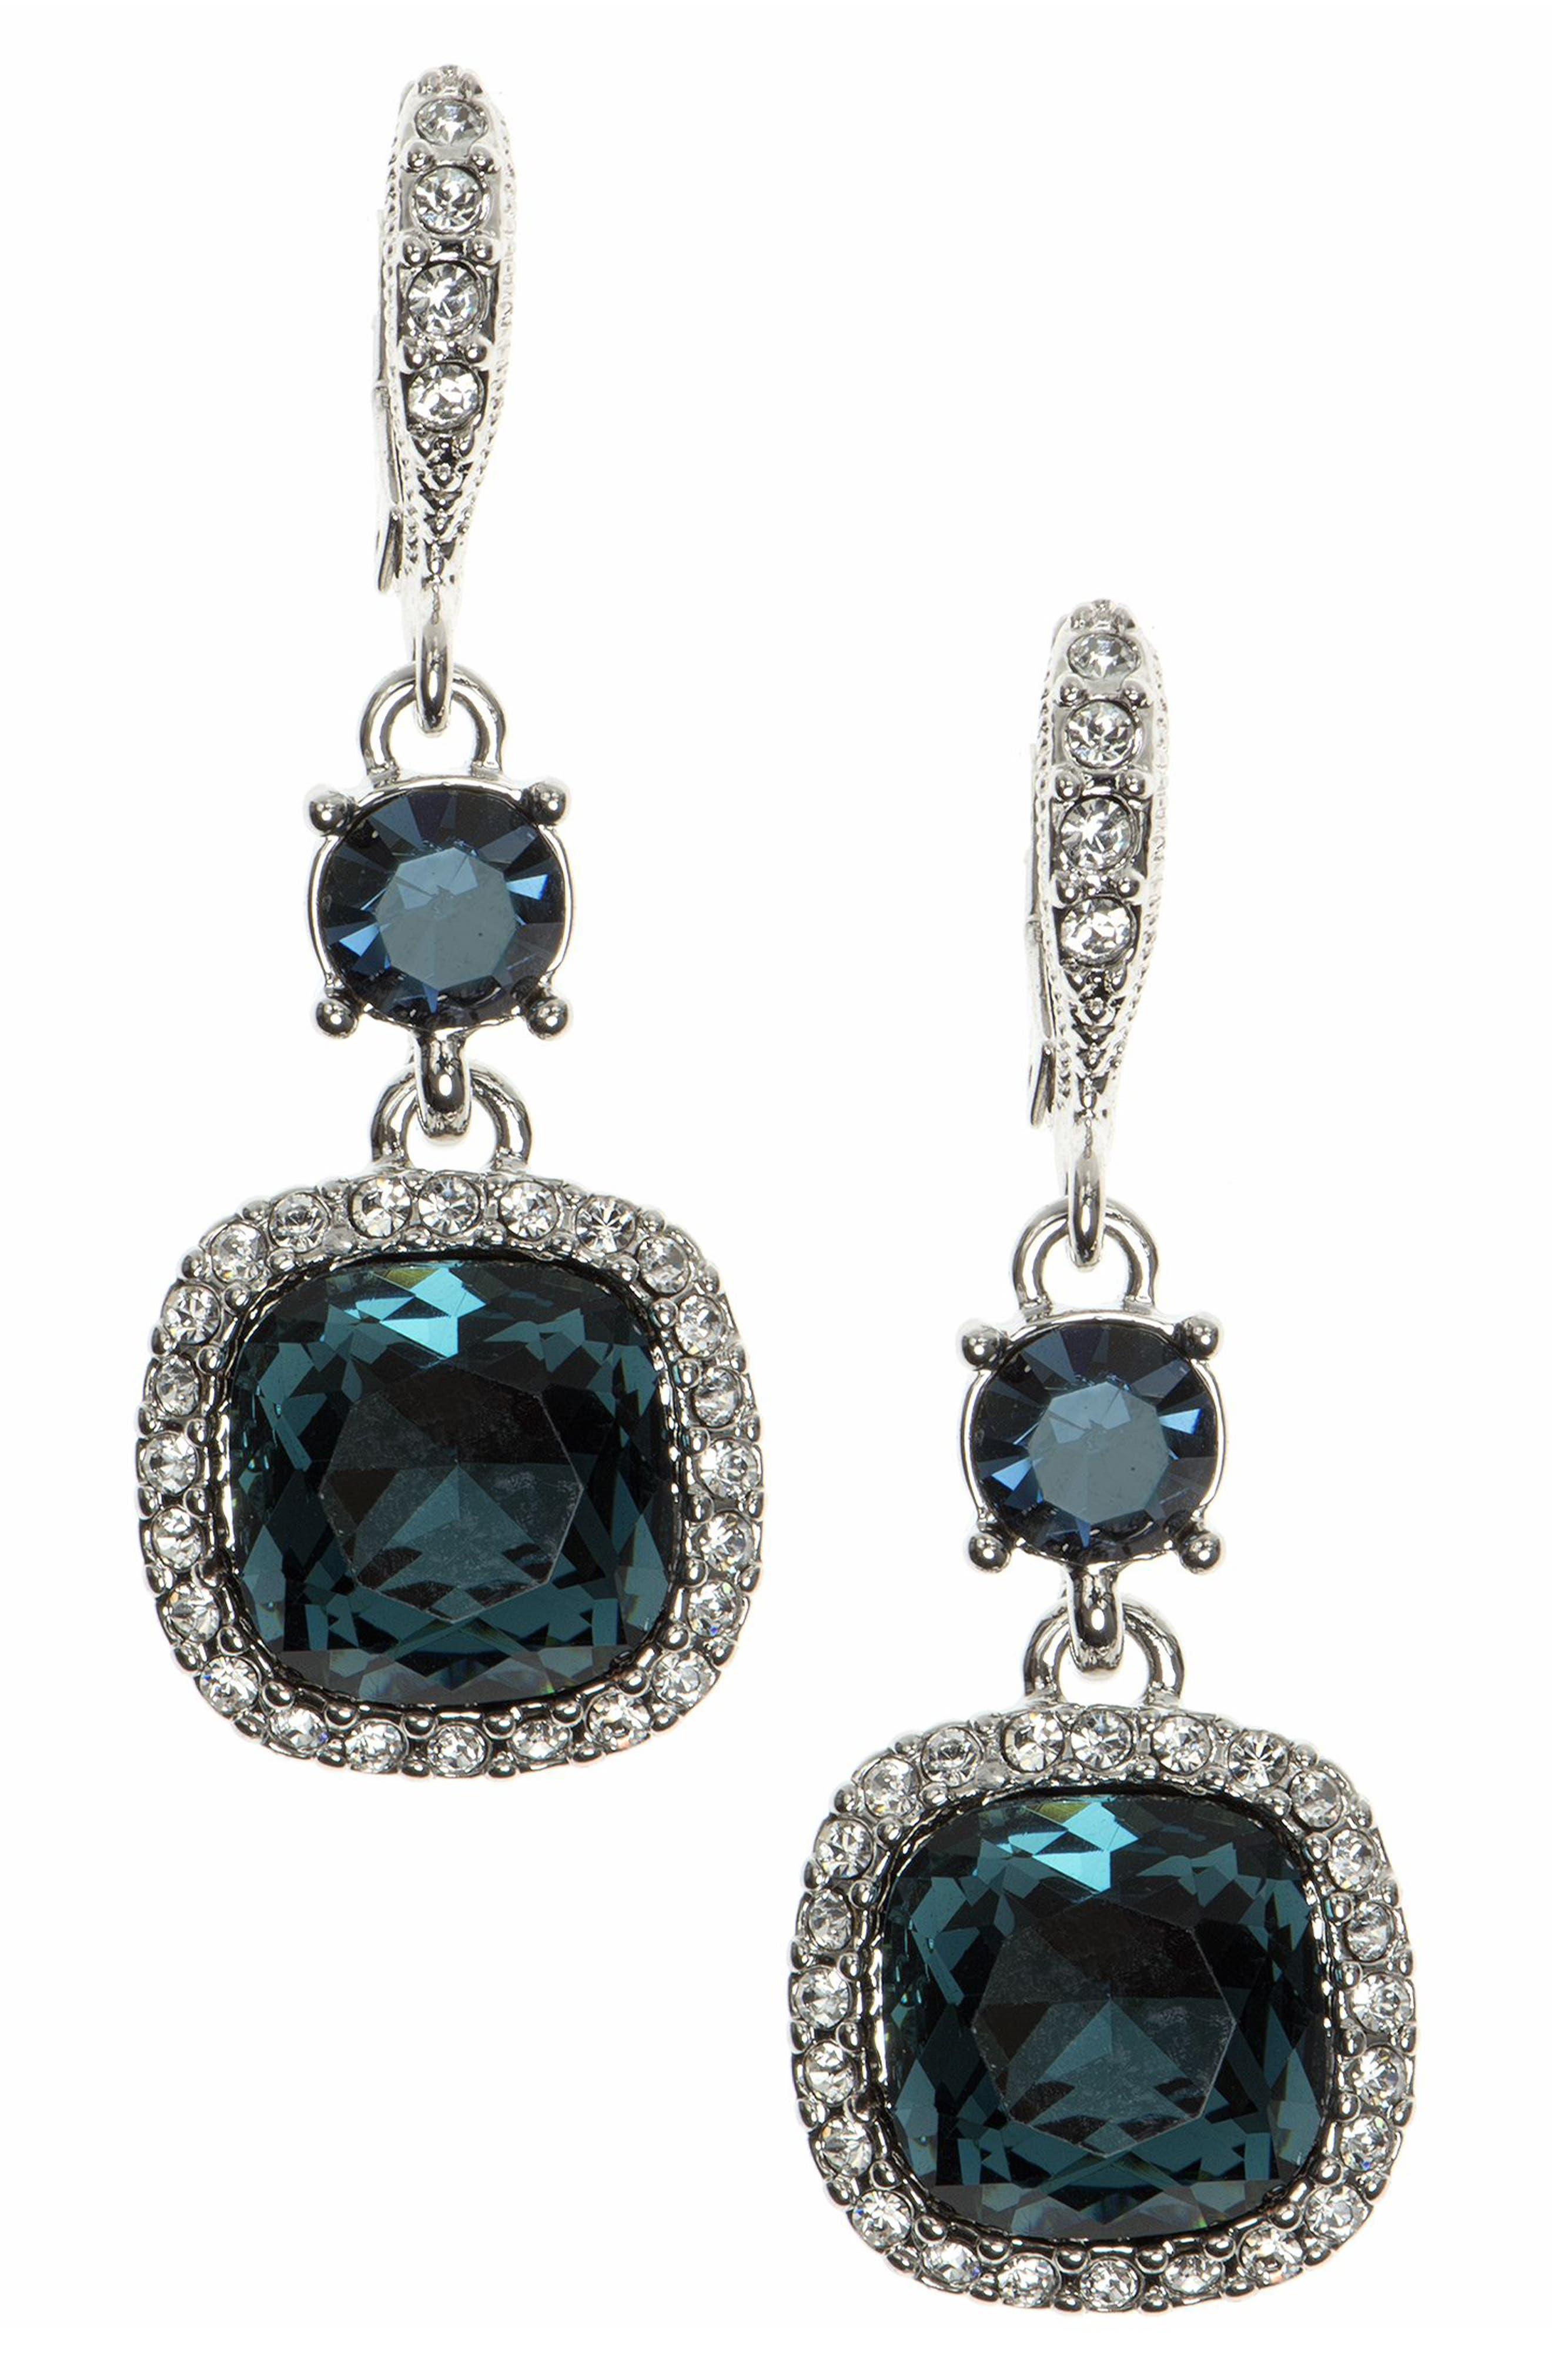 Crystal Drop Earrings,                         Main,                         color, BLUE / SILVER